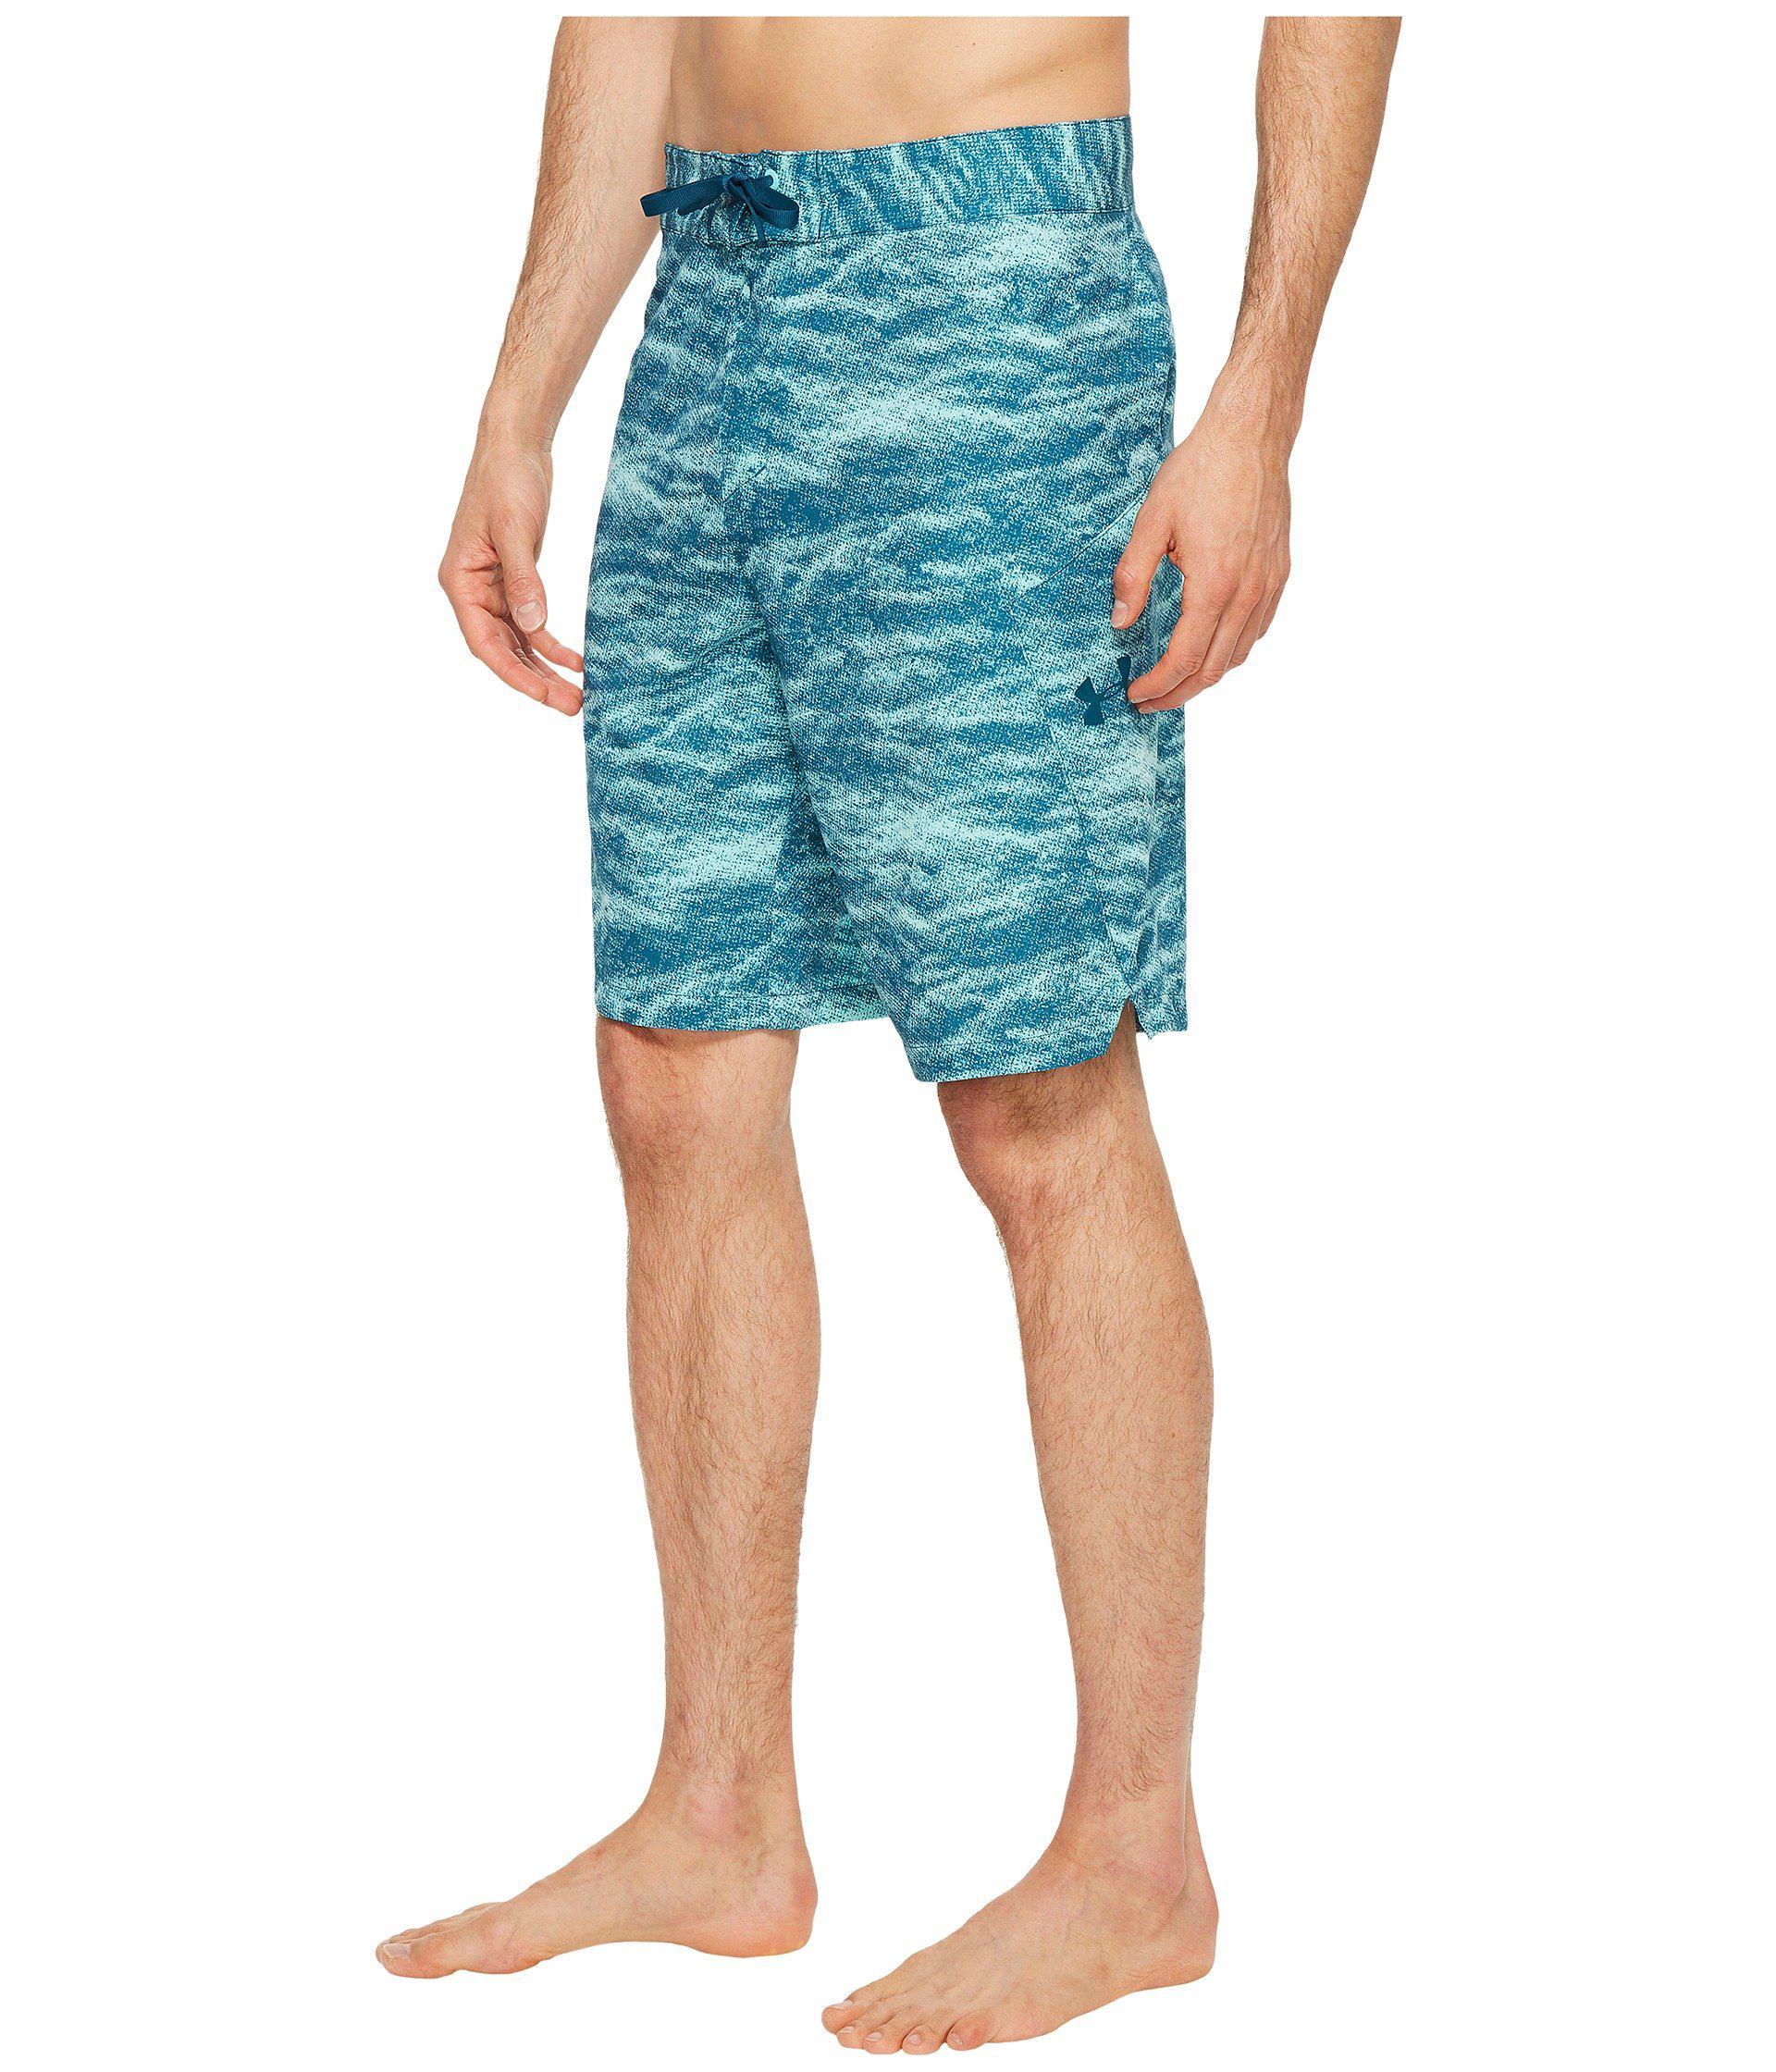 dd2d2faf8469d Lyst - Under Armour Ua Reblek Printed Boardshorts in Blue for Men - Save 27%